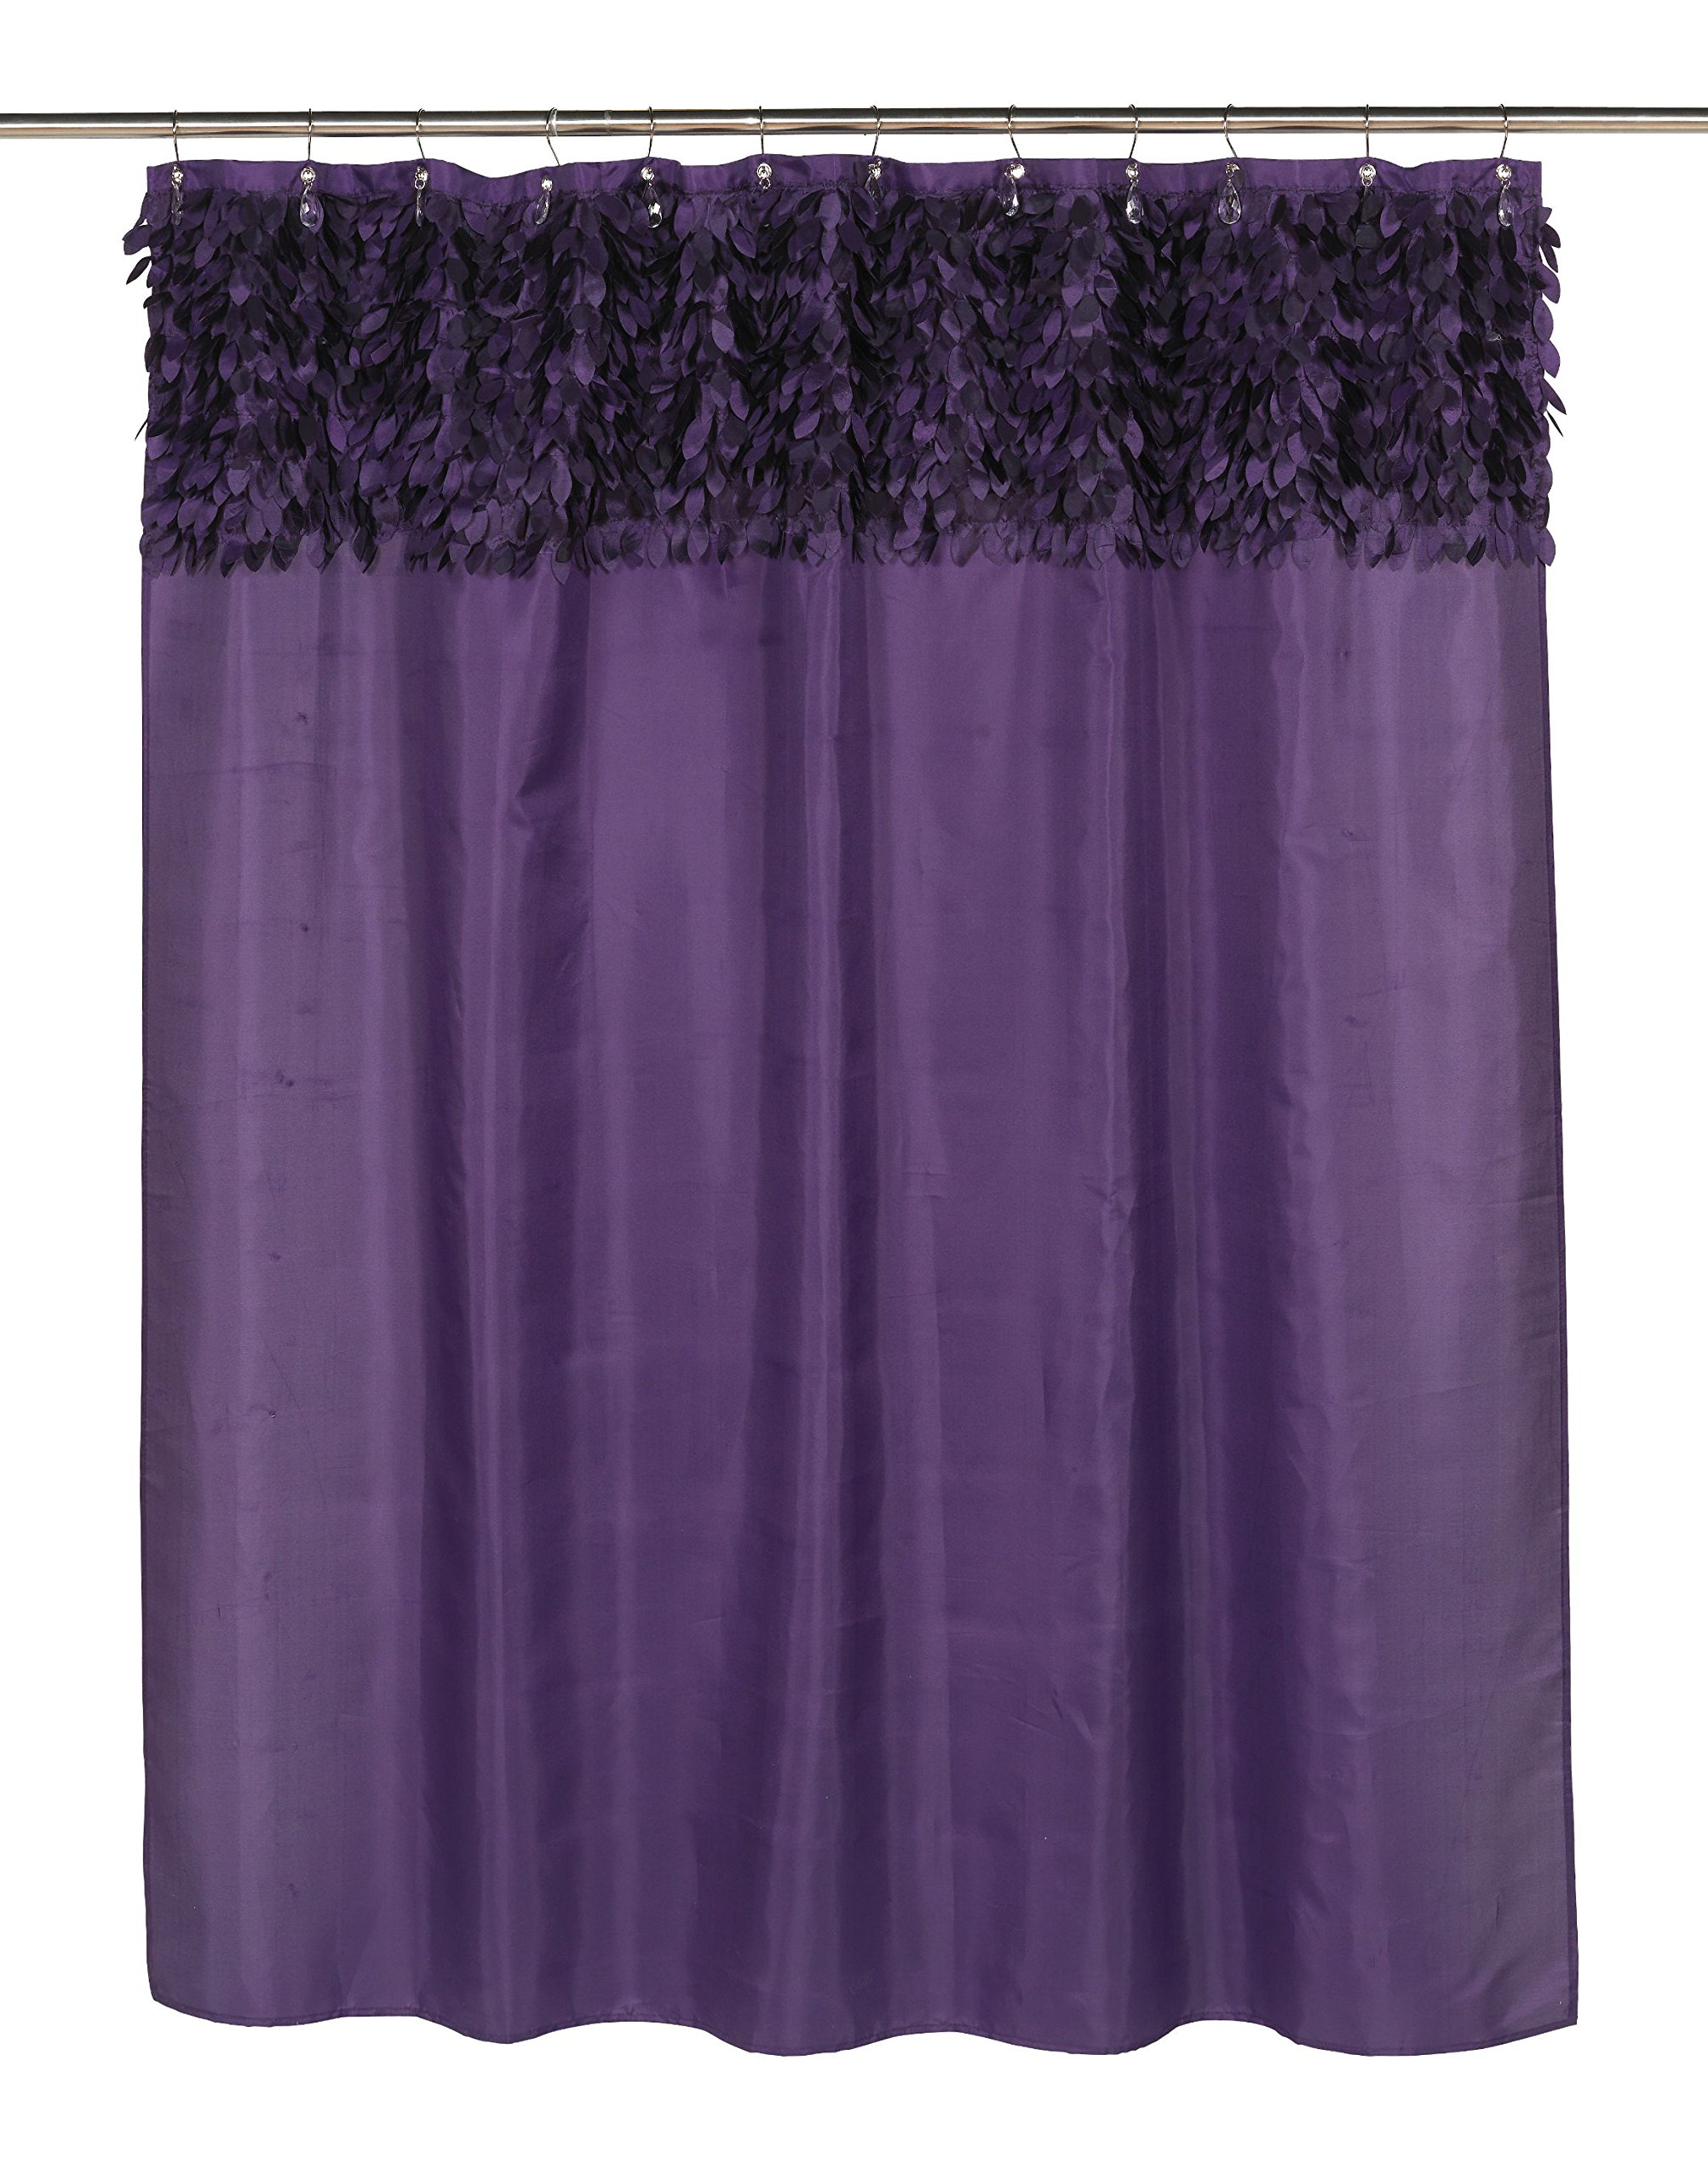 Royal Bath Latin Fever Dance Party Fabric Shower Curtain 70'' x 72'' (Purple)